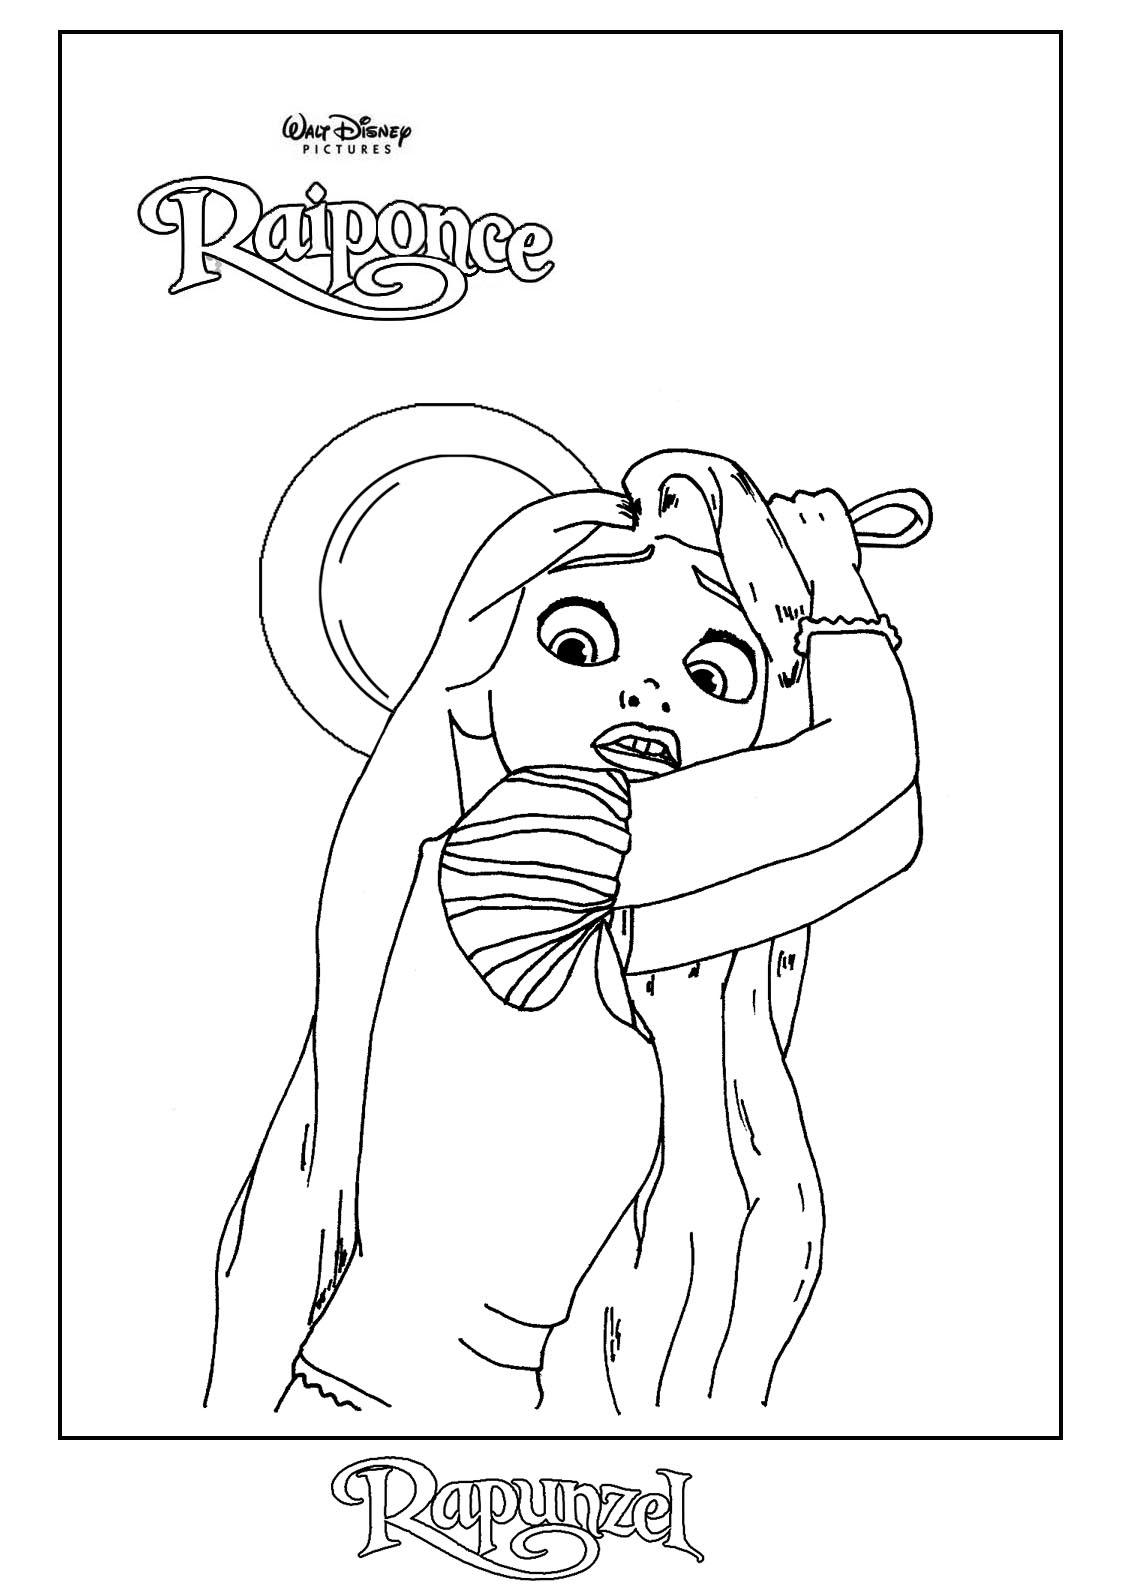 Bebé rapunzel Disney para colorear - Imagui